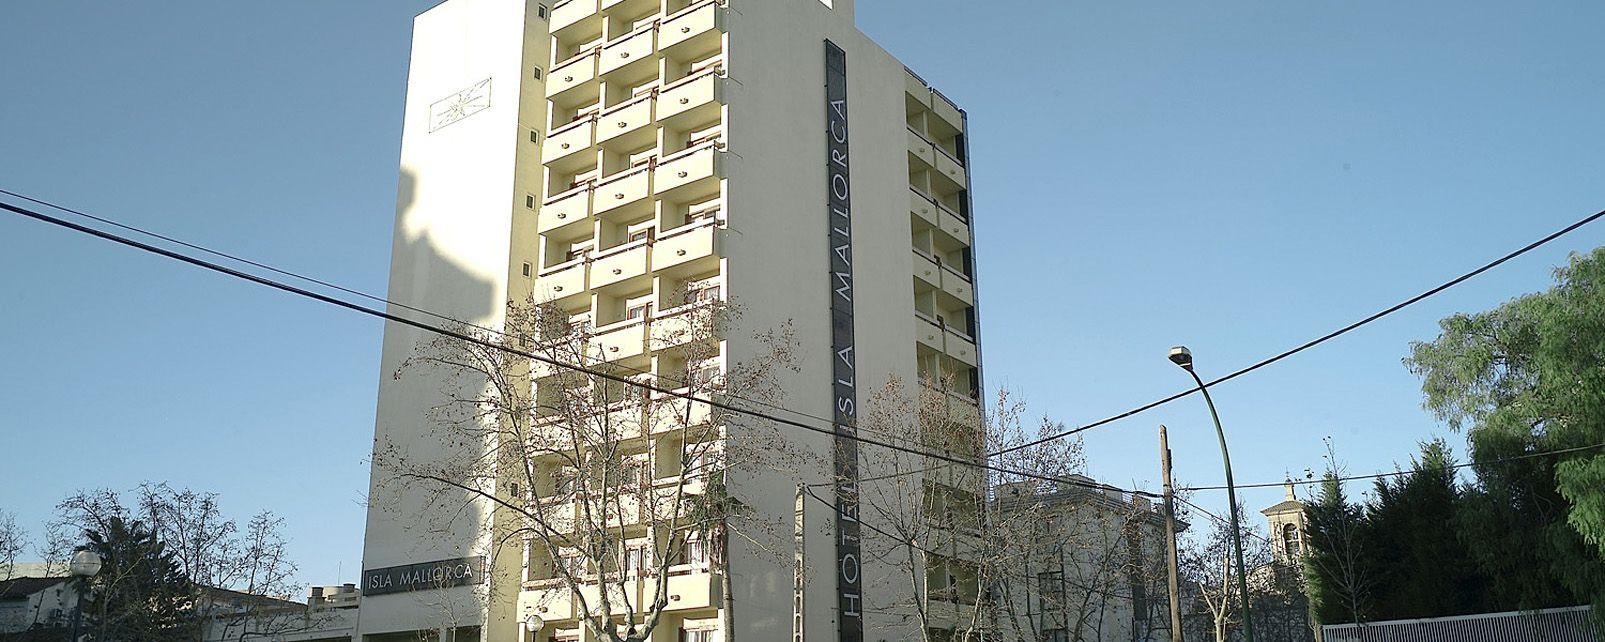 Hôtel Isla Mallorca